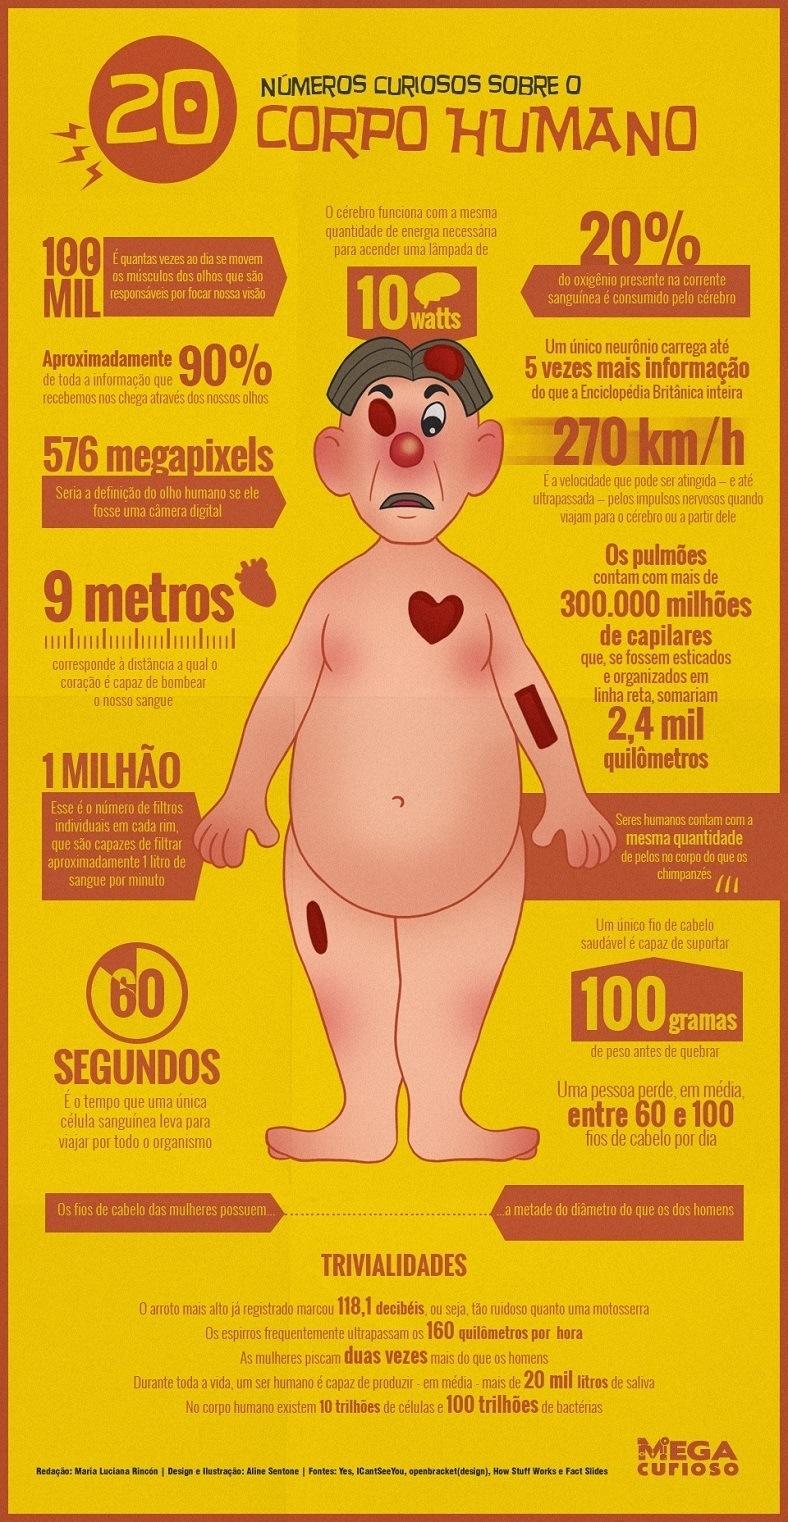 Curiosidades sobre o Corpo Humano: 20 números curiosos